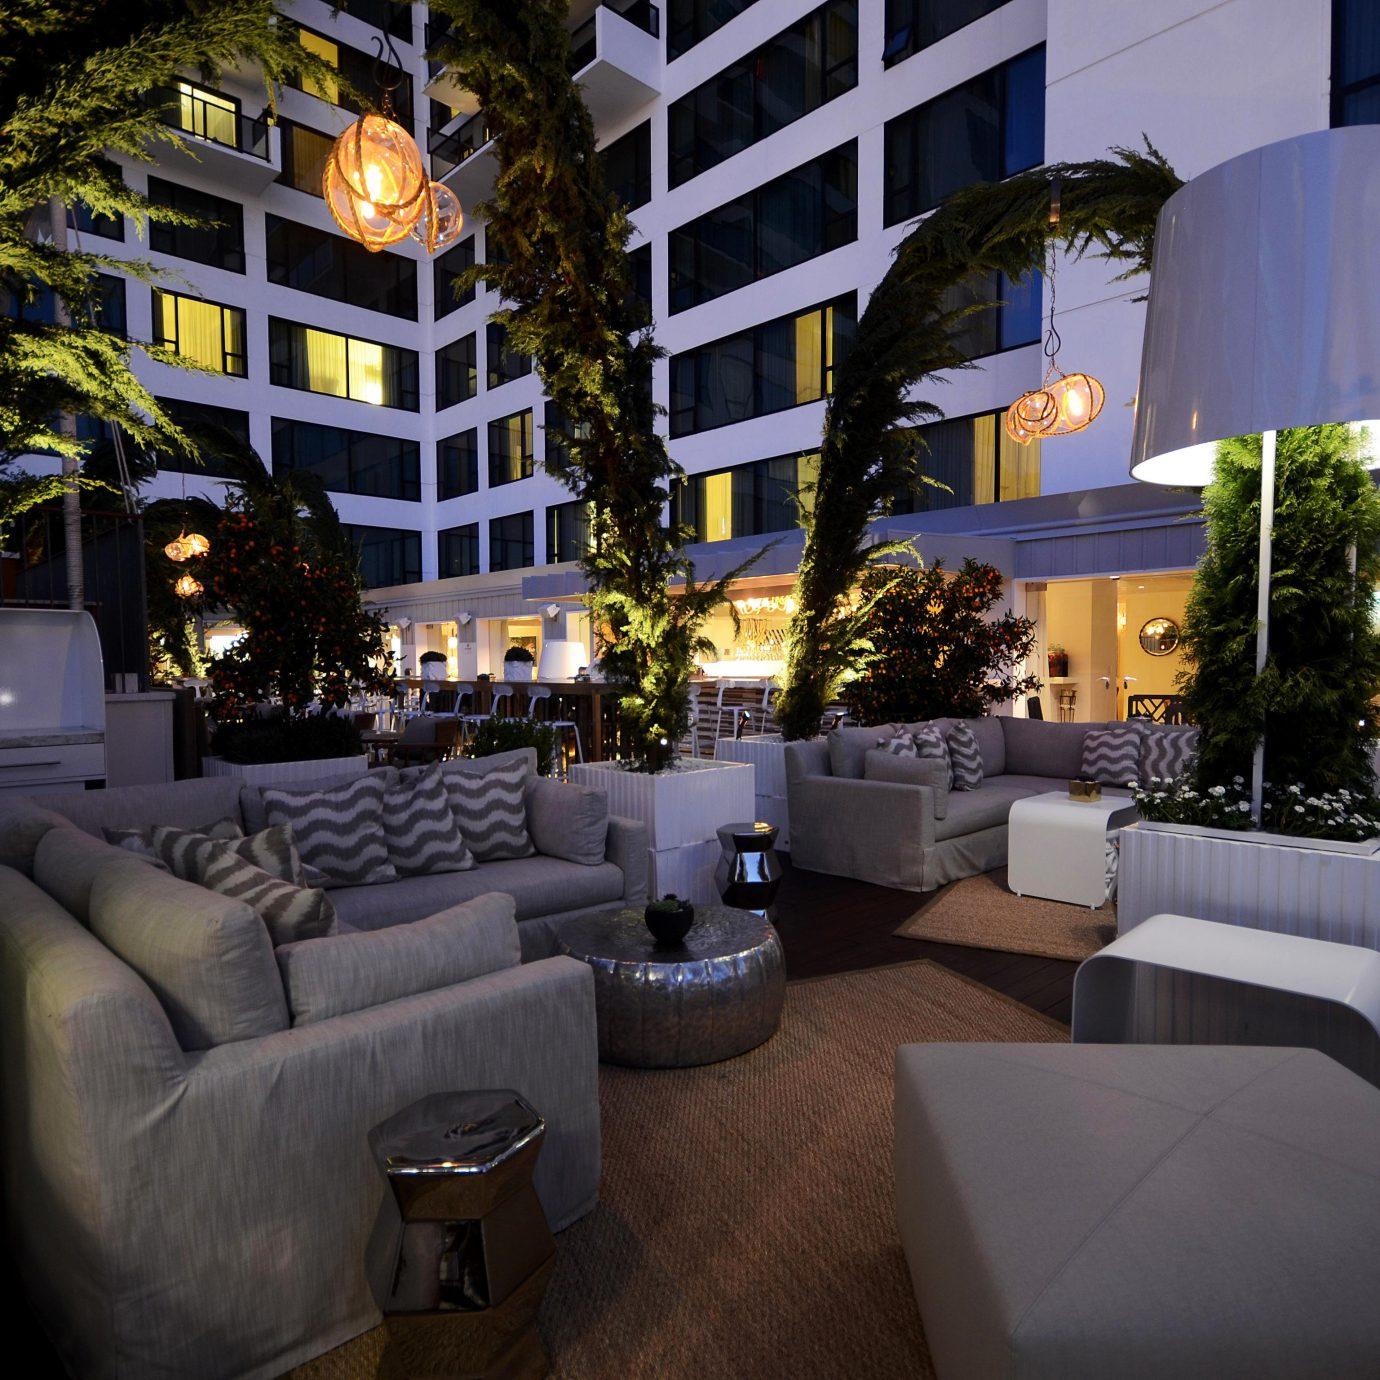 Boutique City Deck Drink Lounge Patio property condominium home Lobby Resort